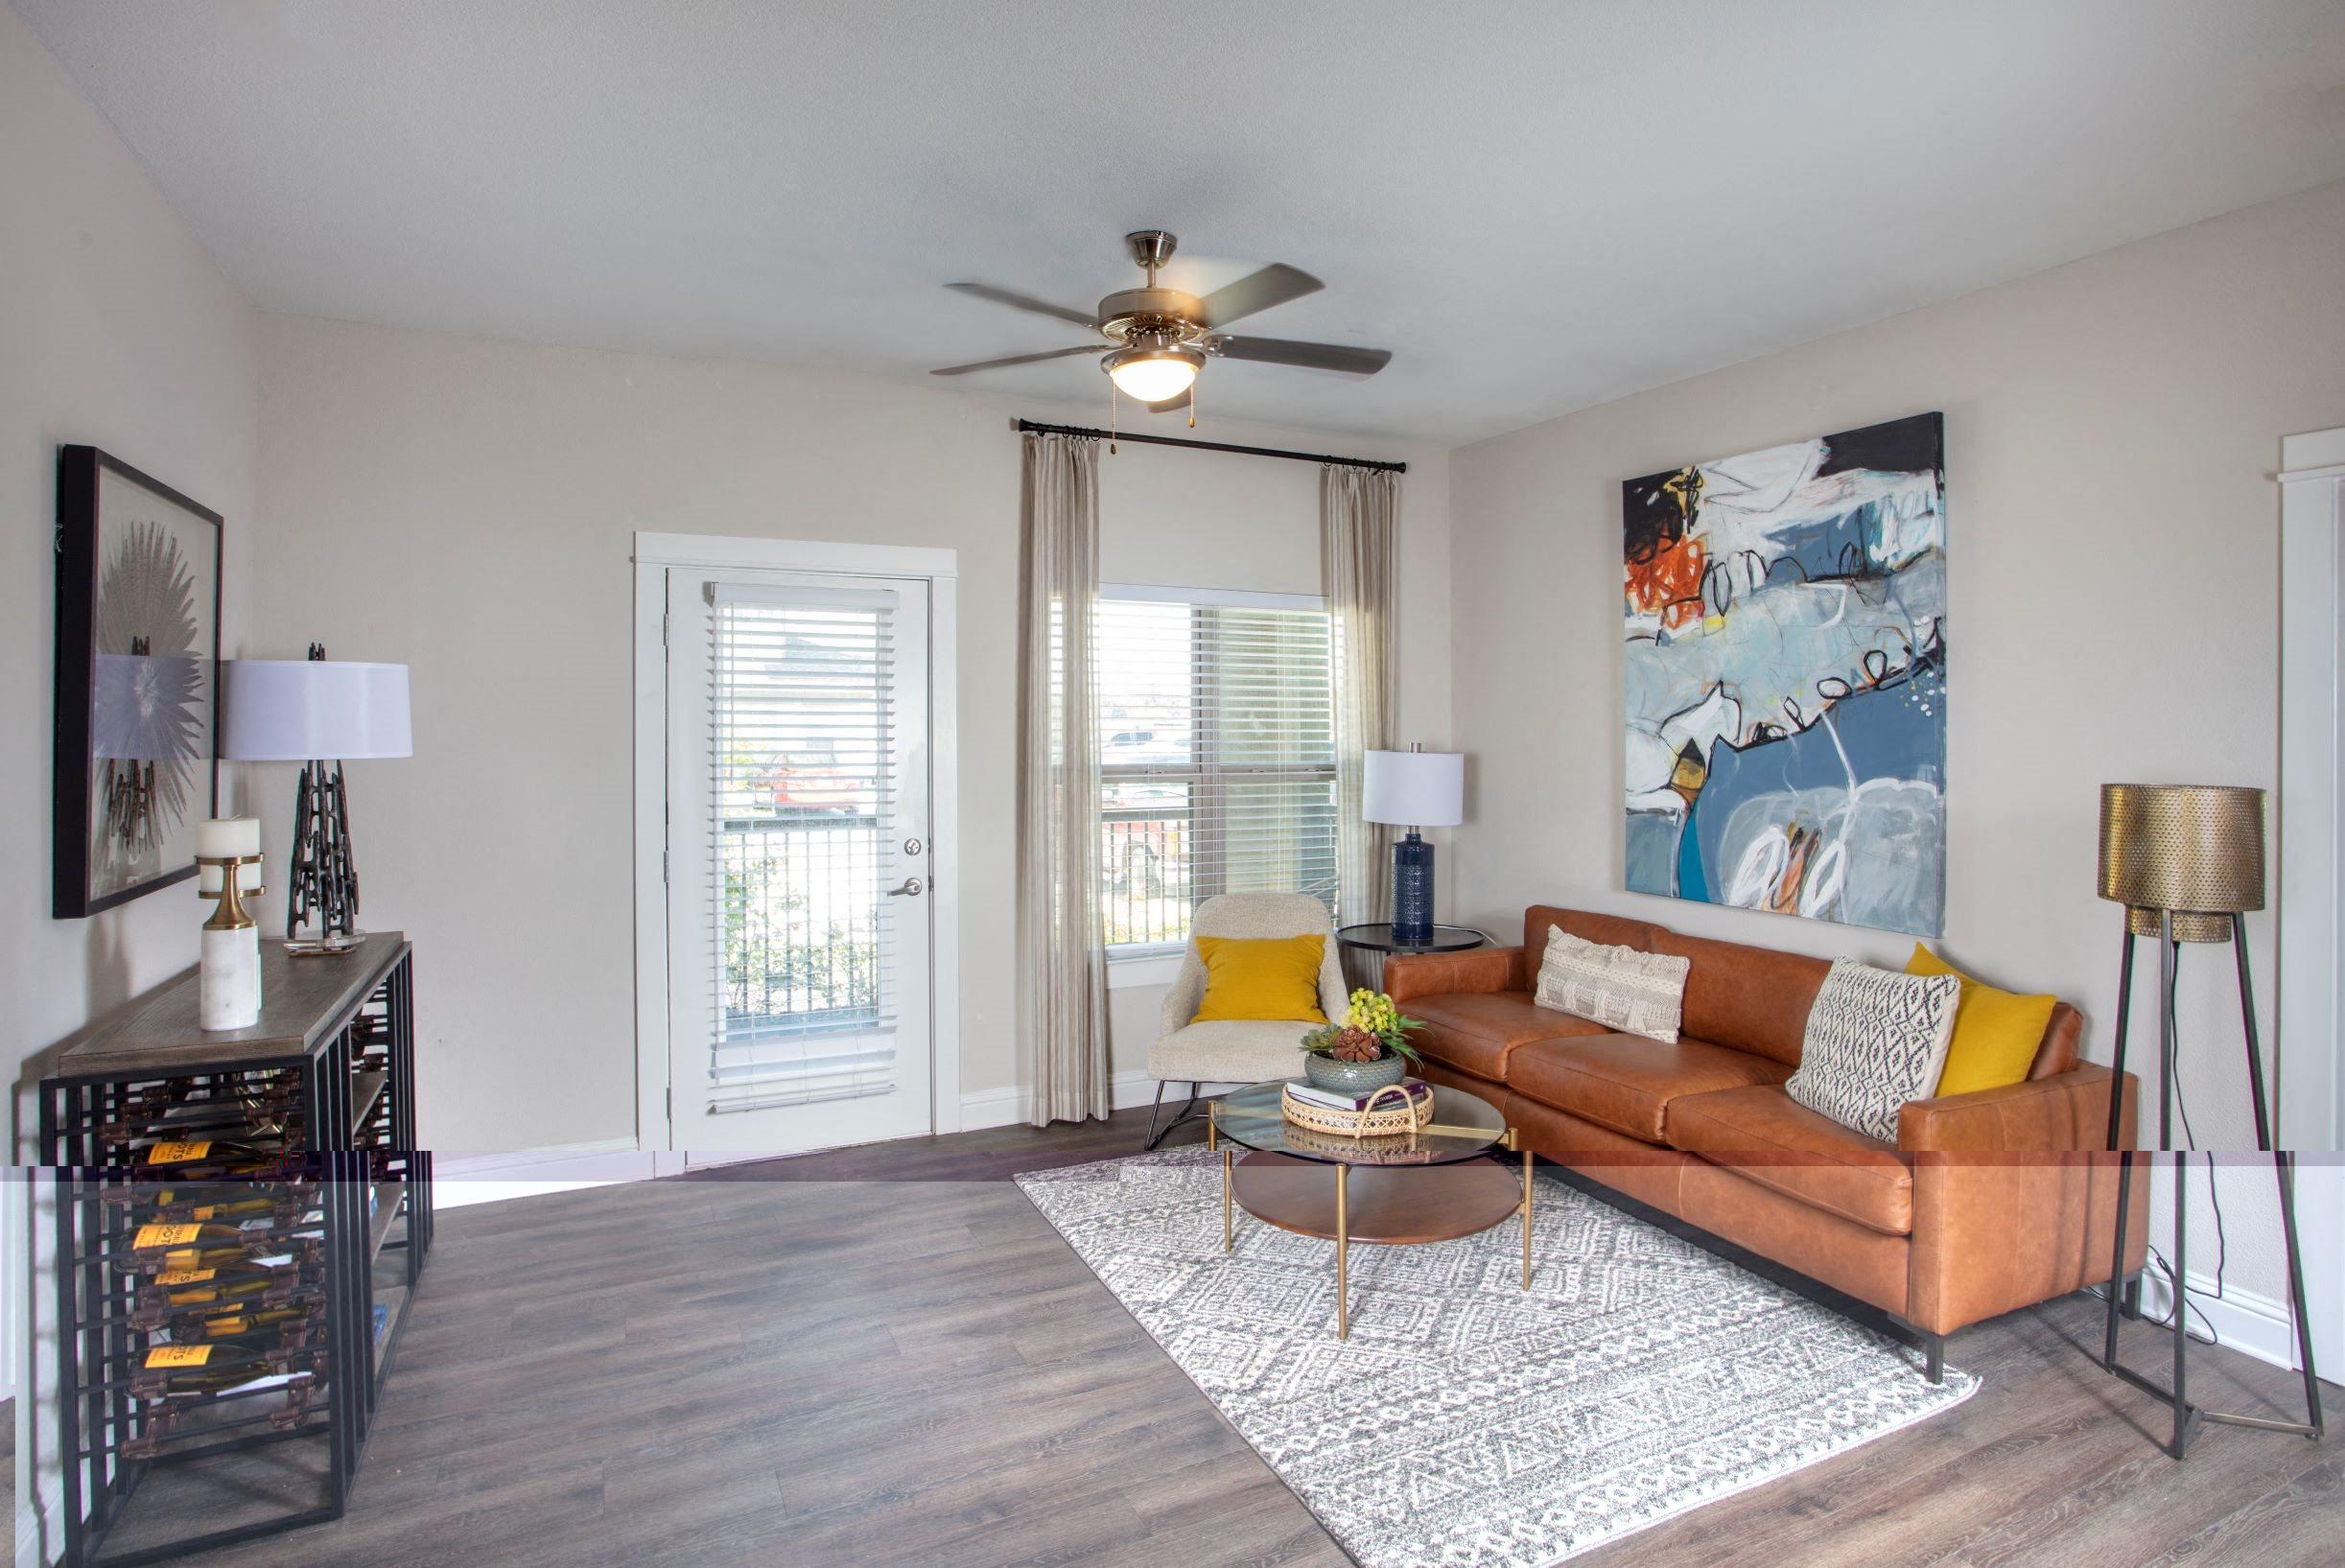 Living Room at Legacy at 2020